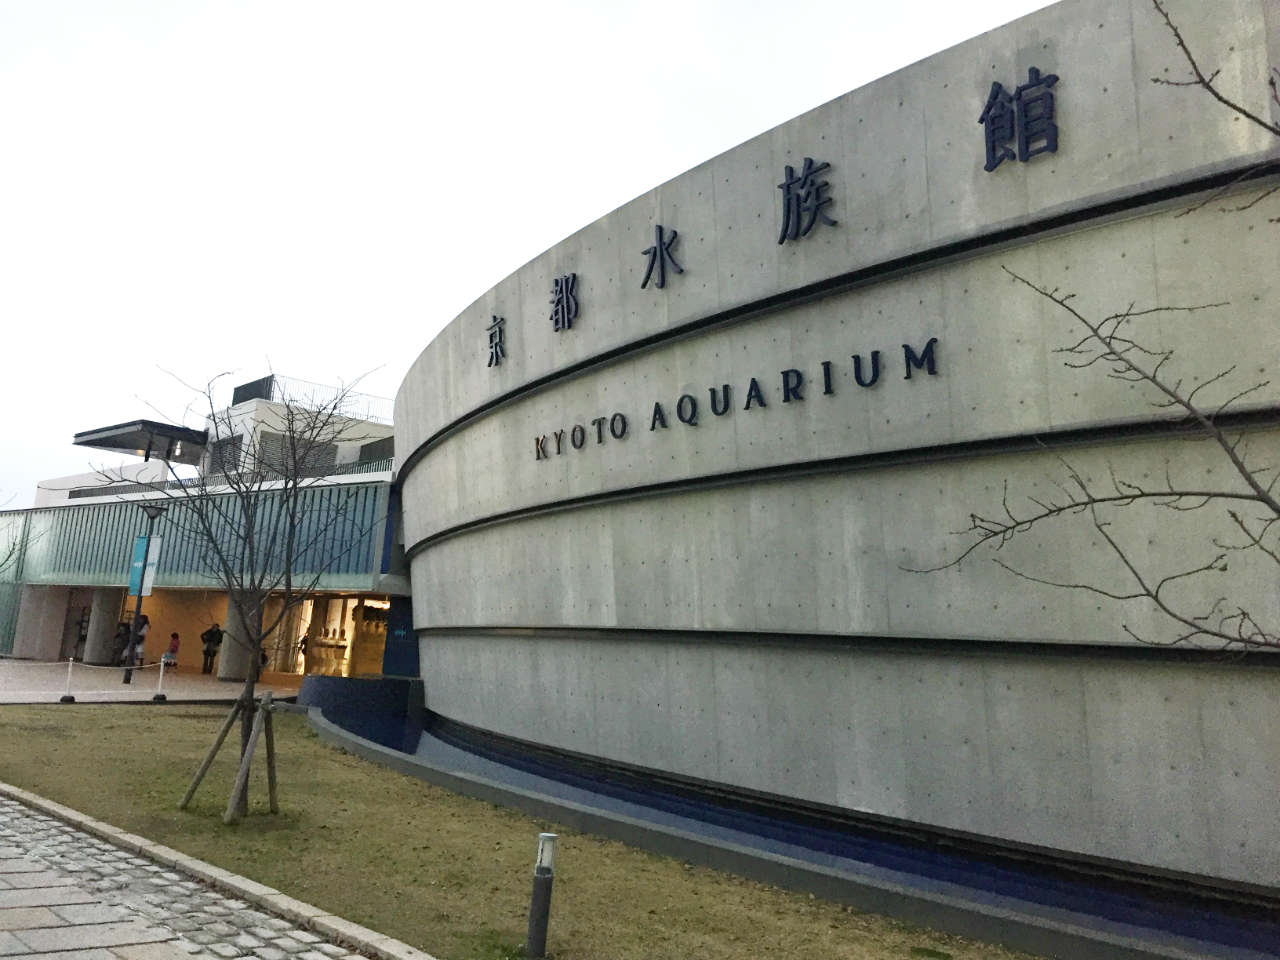 kyoto-aquarium-gaikan